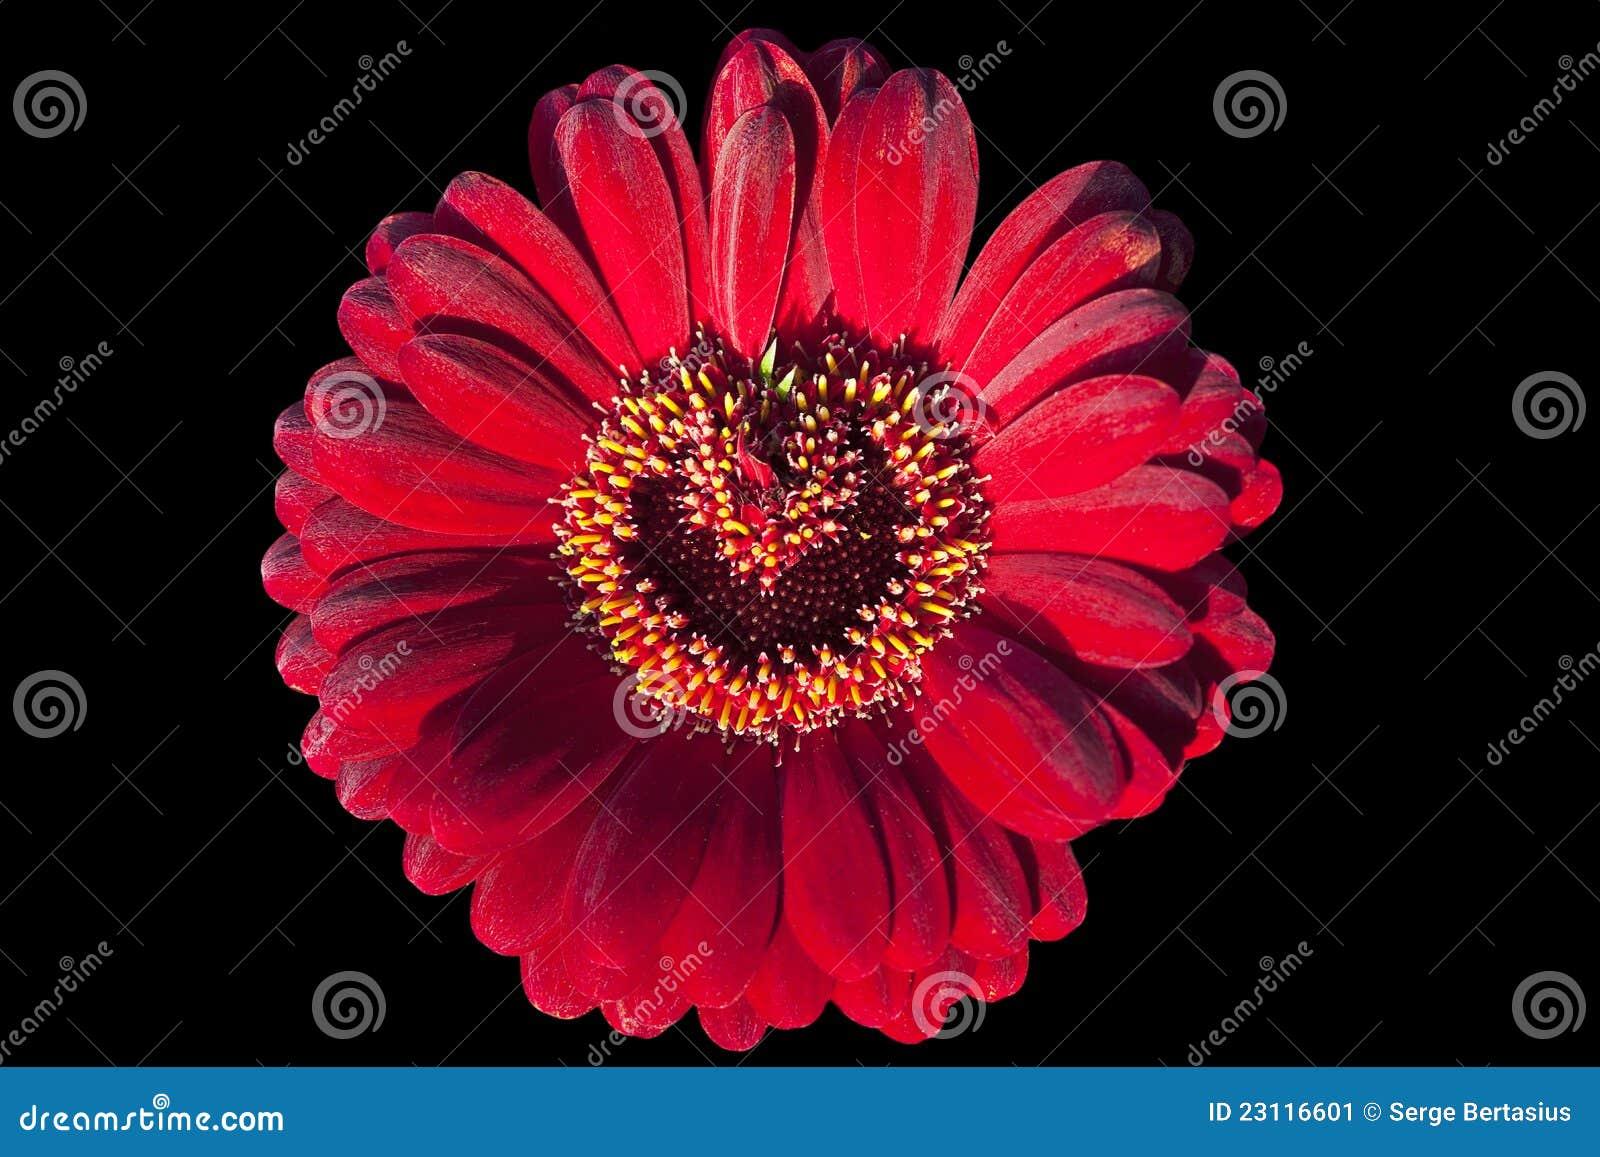 Fleur Rouge De Gerbera Image Stock Image Du Marguerite 23116601